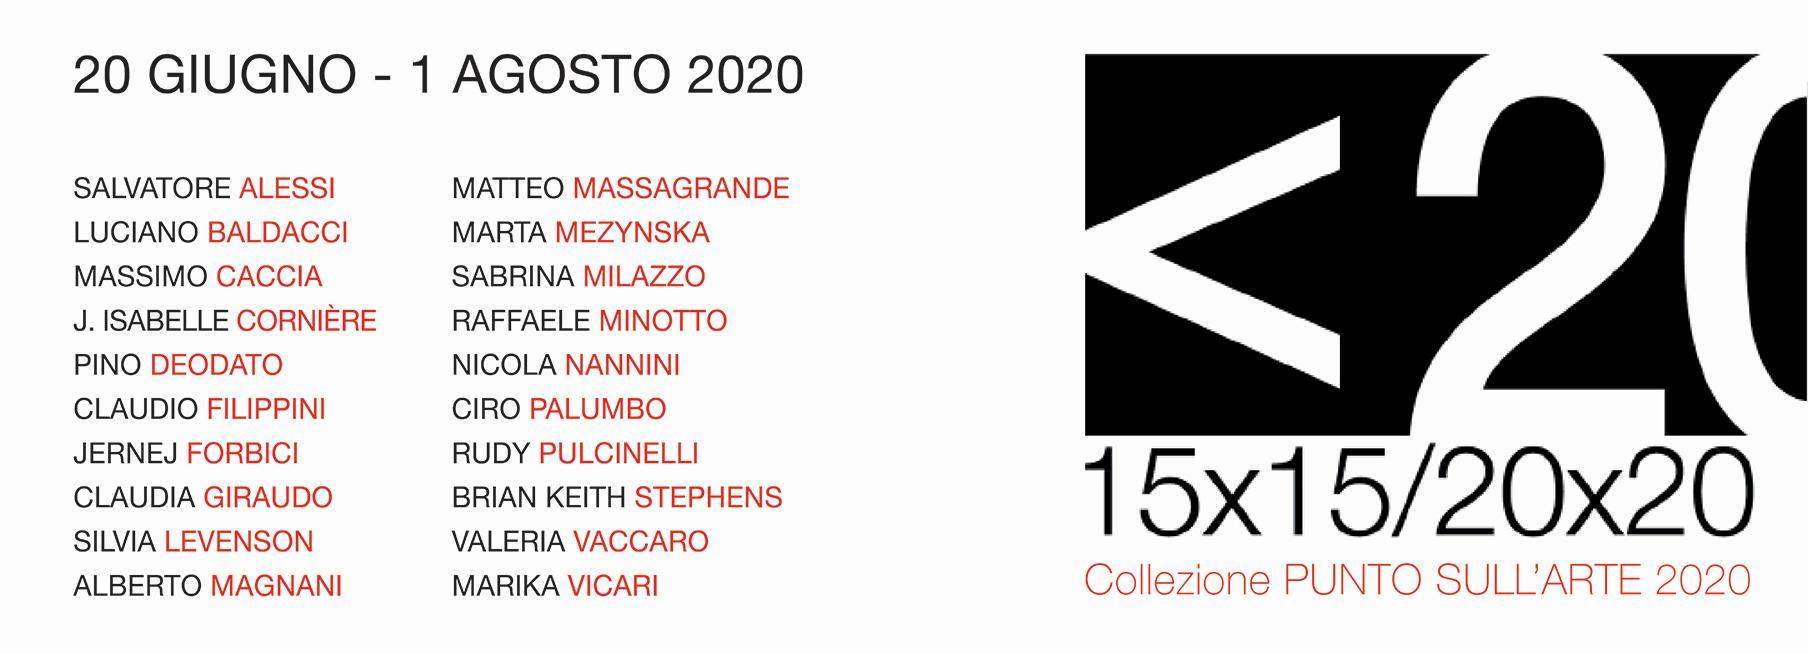 <20 15x15/20x20 2020